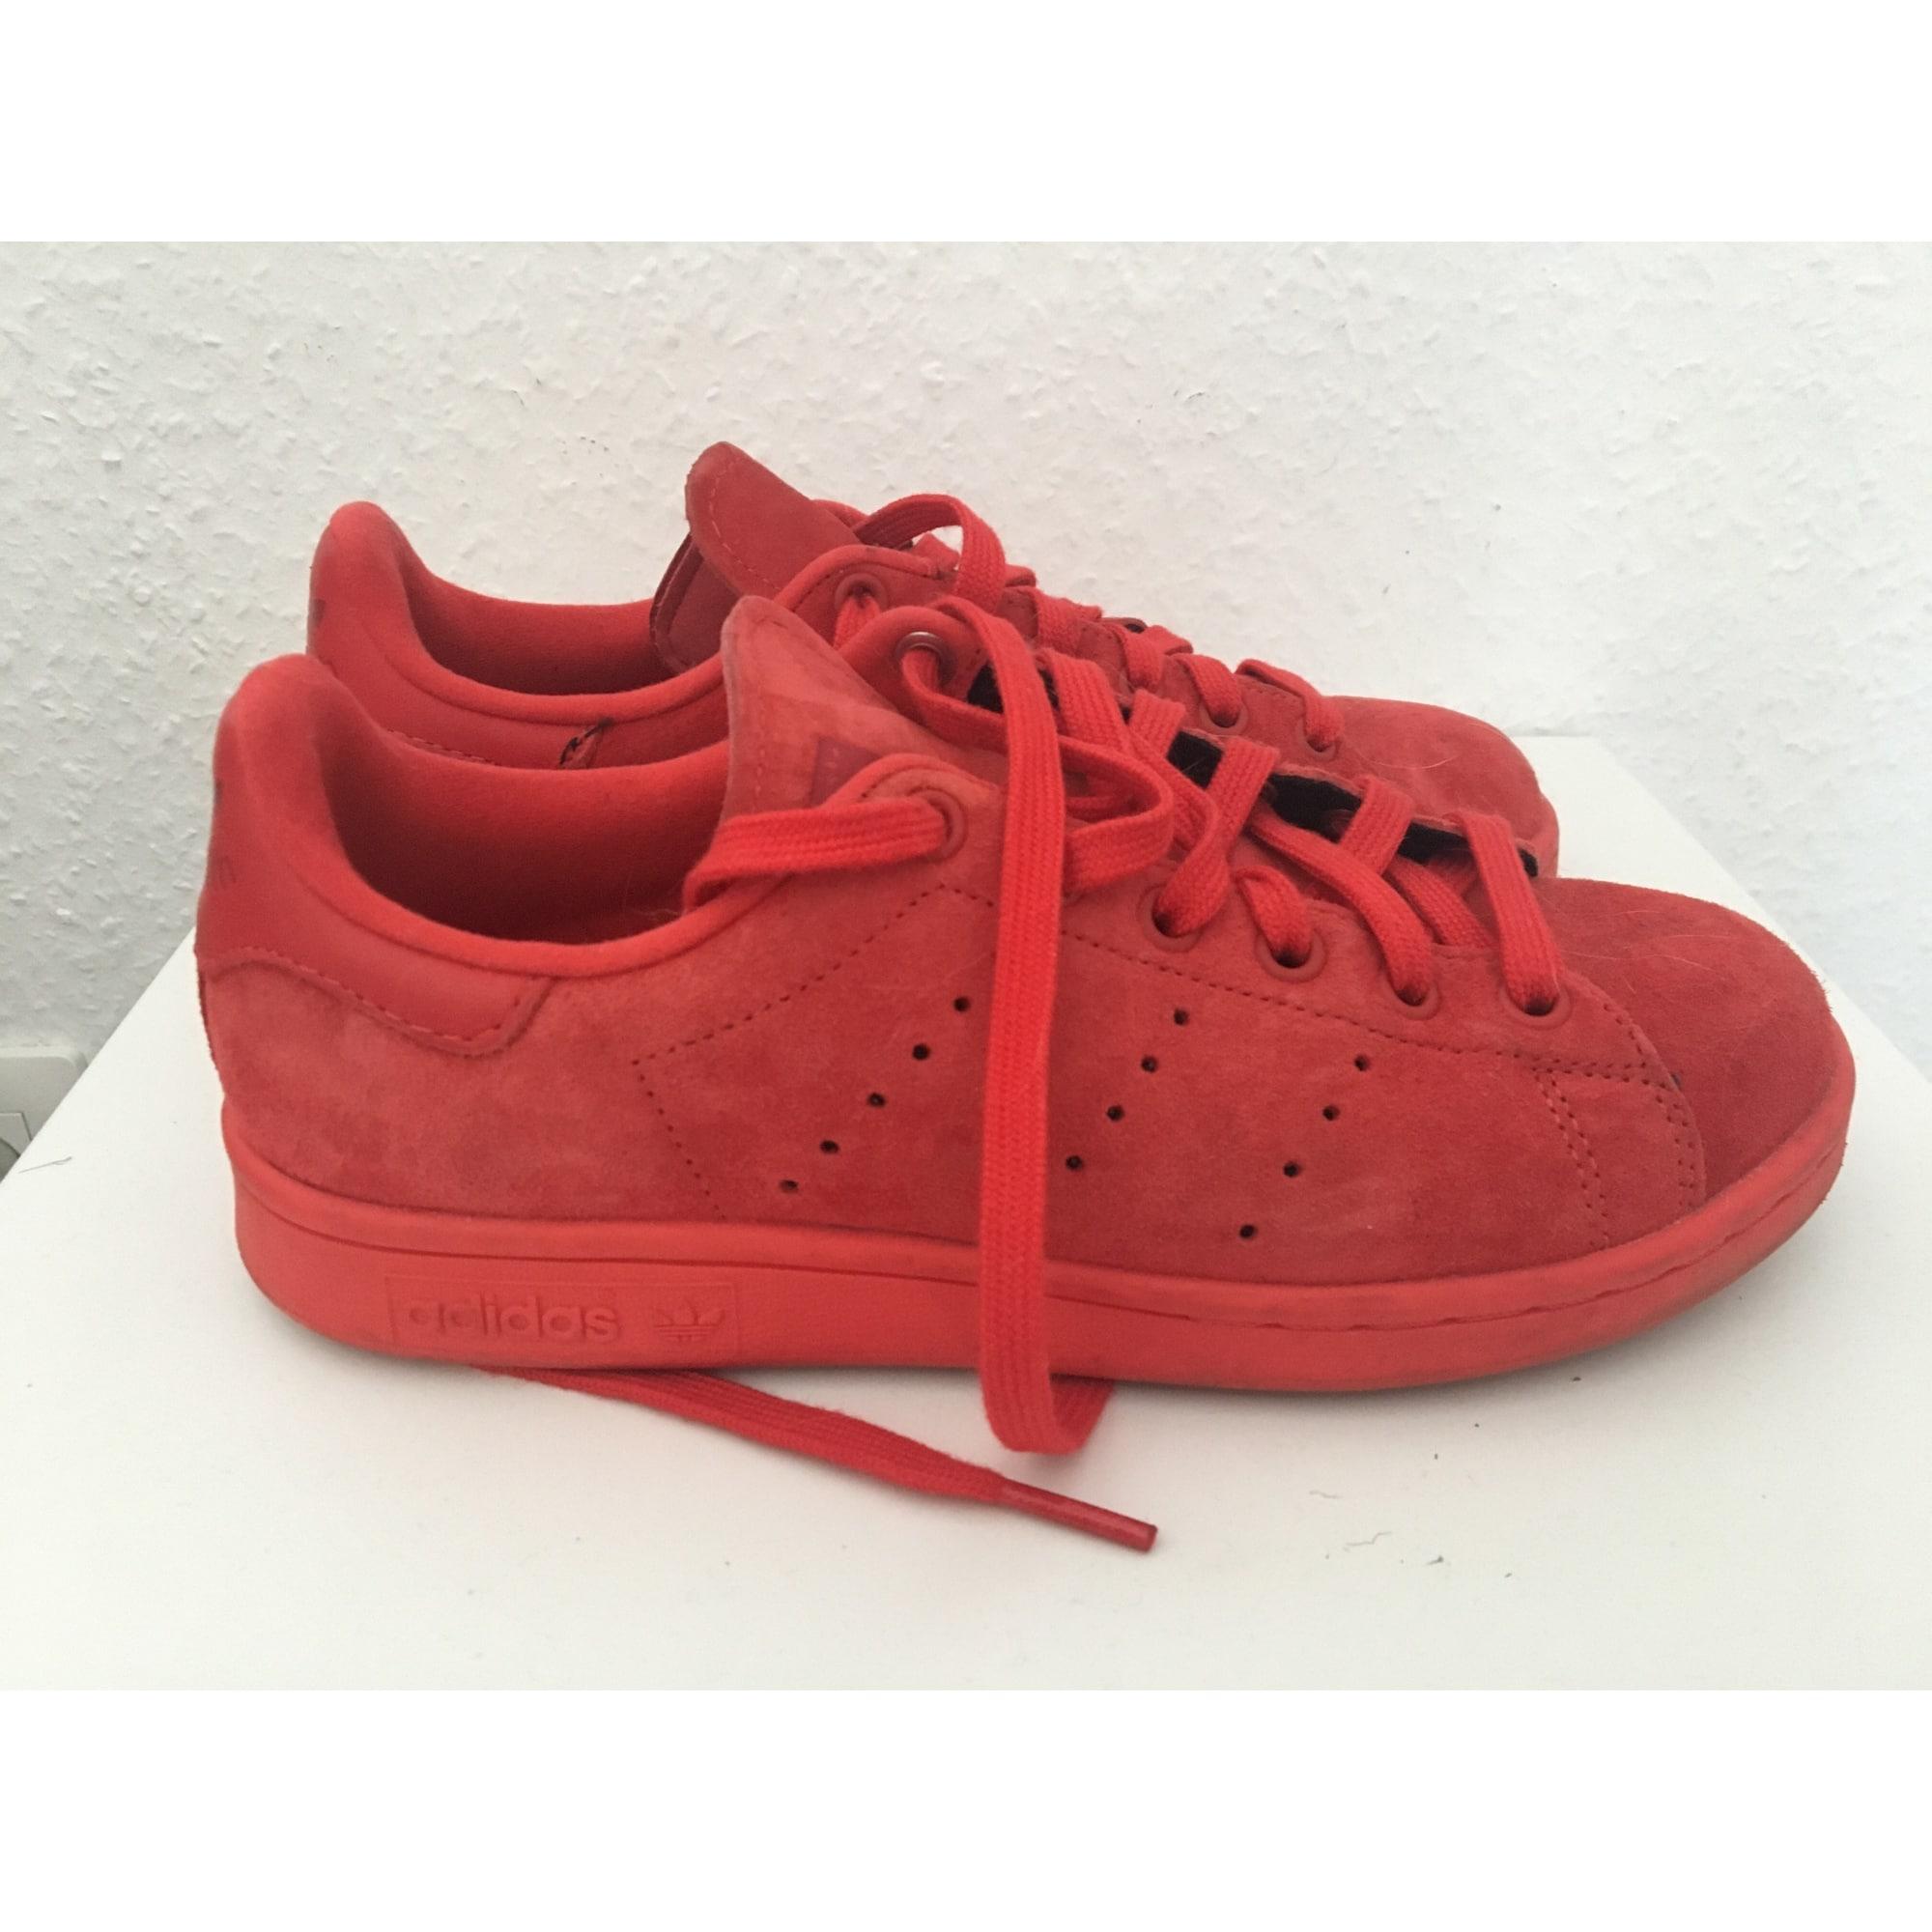 Vendu Birgel Baskets 6018176 Rouge Adidas 37 Par shrCxdBQt